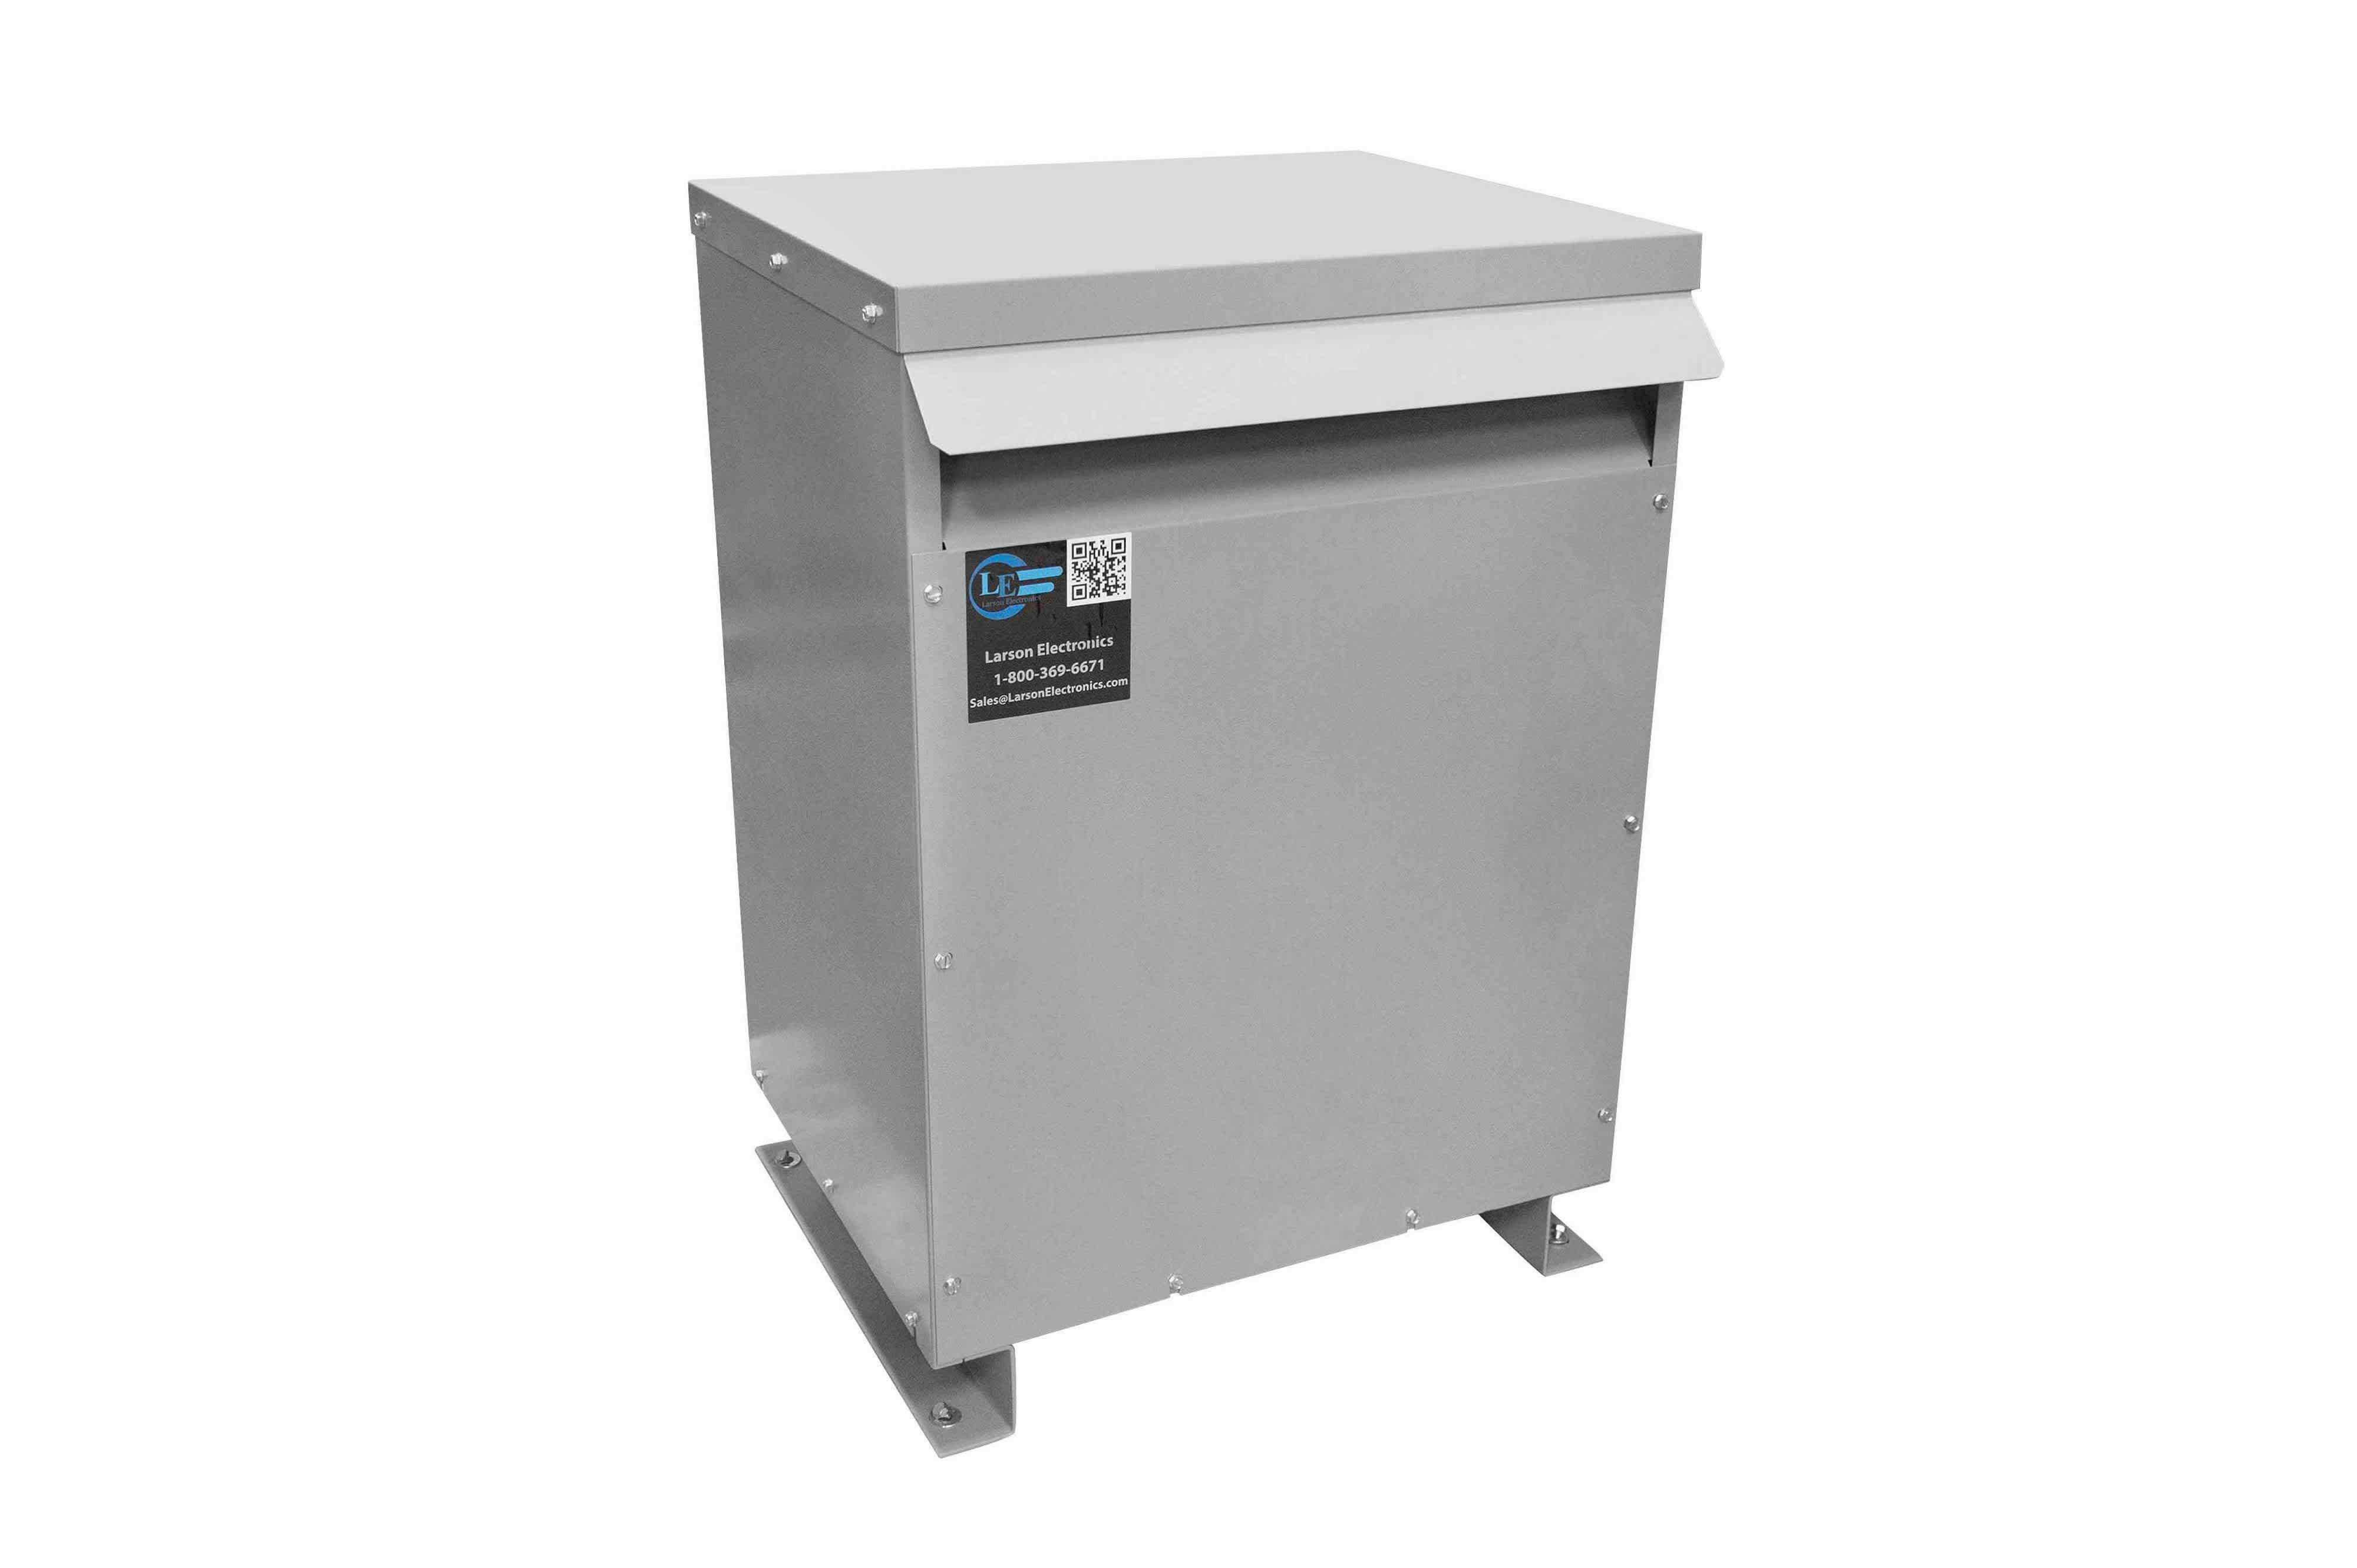 700 kVA 3PH Isolation Transformer, 230V Wye Primary, 480V Delta Secondary, N3R, Ventilated, 60 Hz